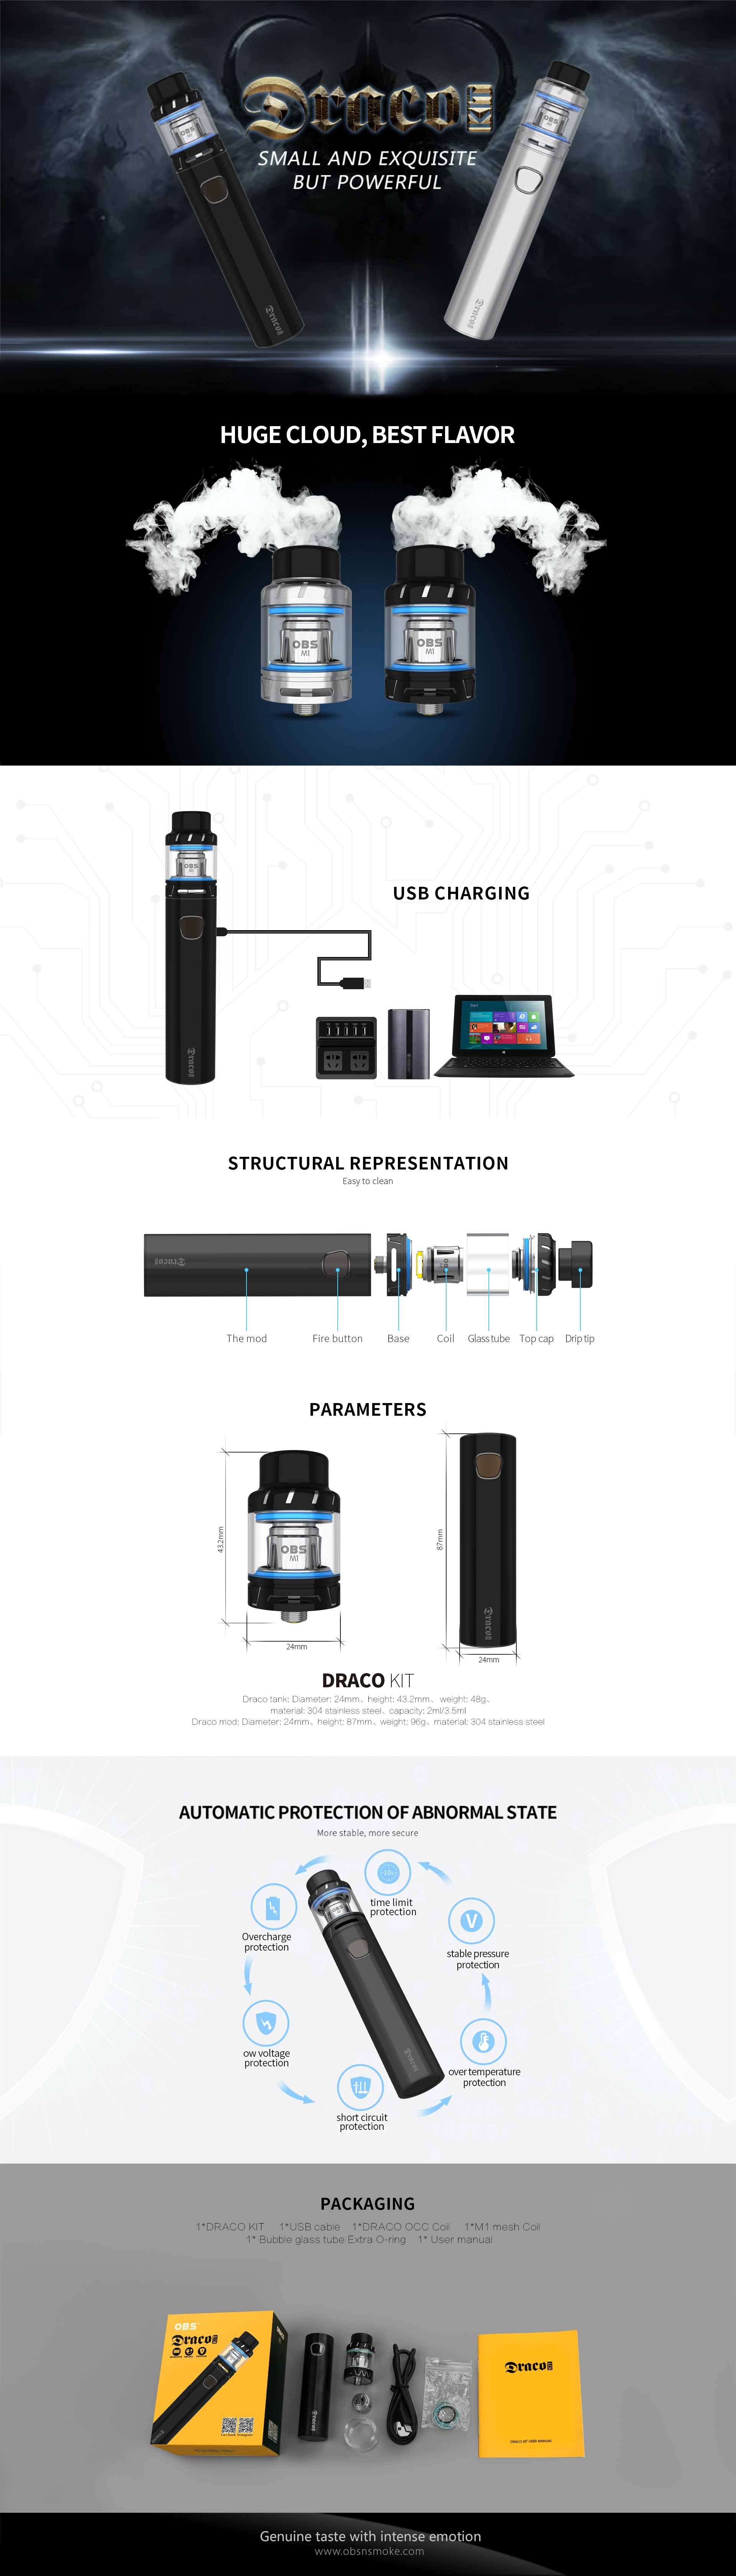 OBS Draco kit, detalle